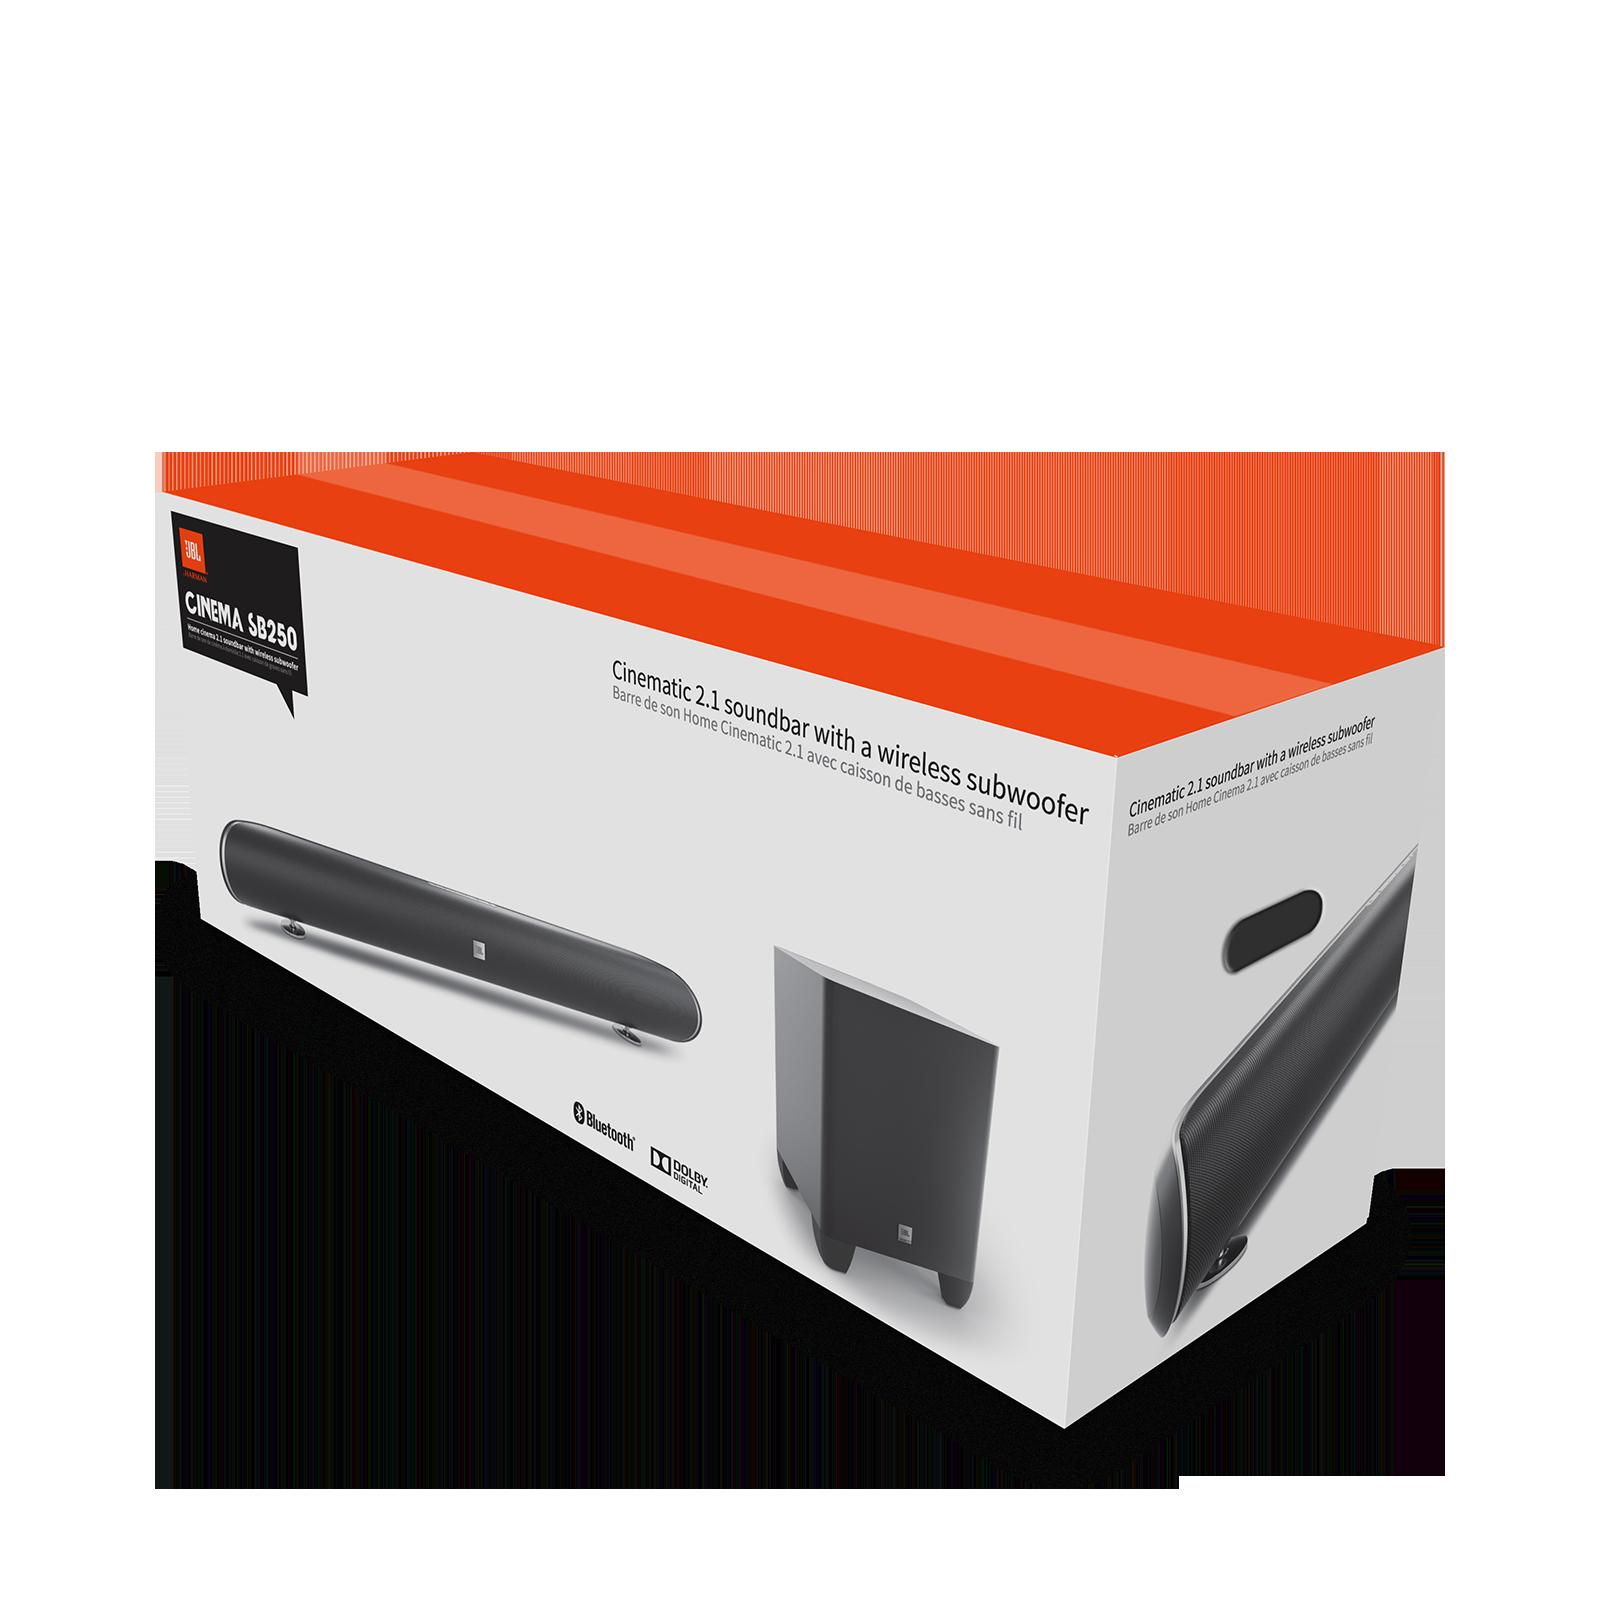 Cinema Sb250 200w Home Cinema Soundbar With Wireless Subwoofer  # Table Tv Avec Home Cinema